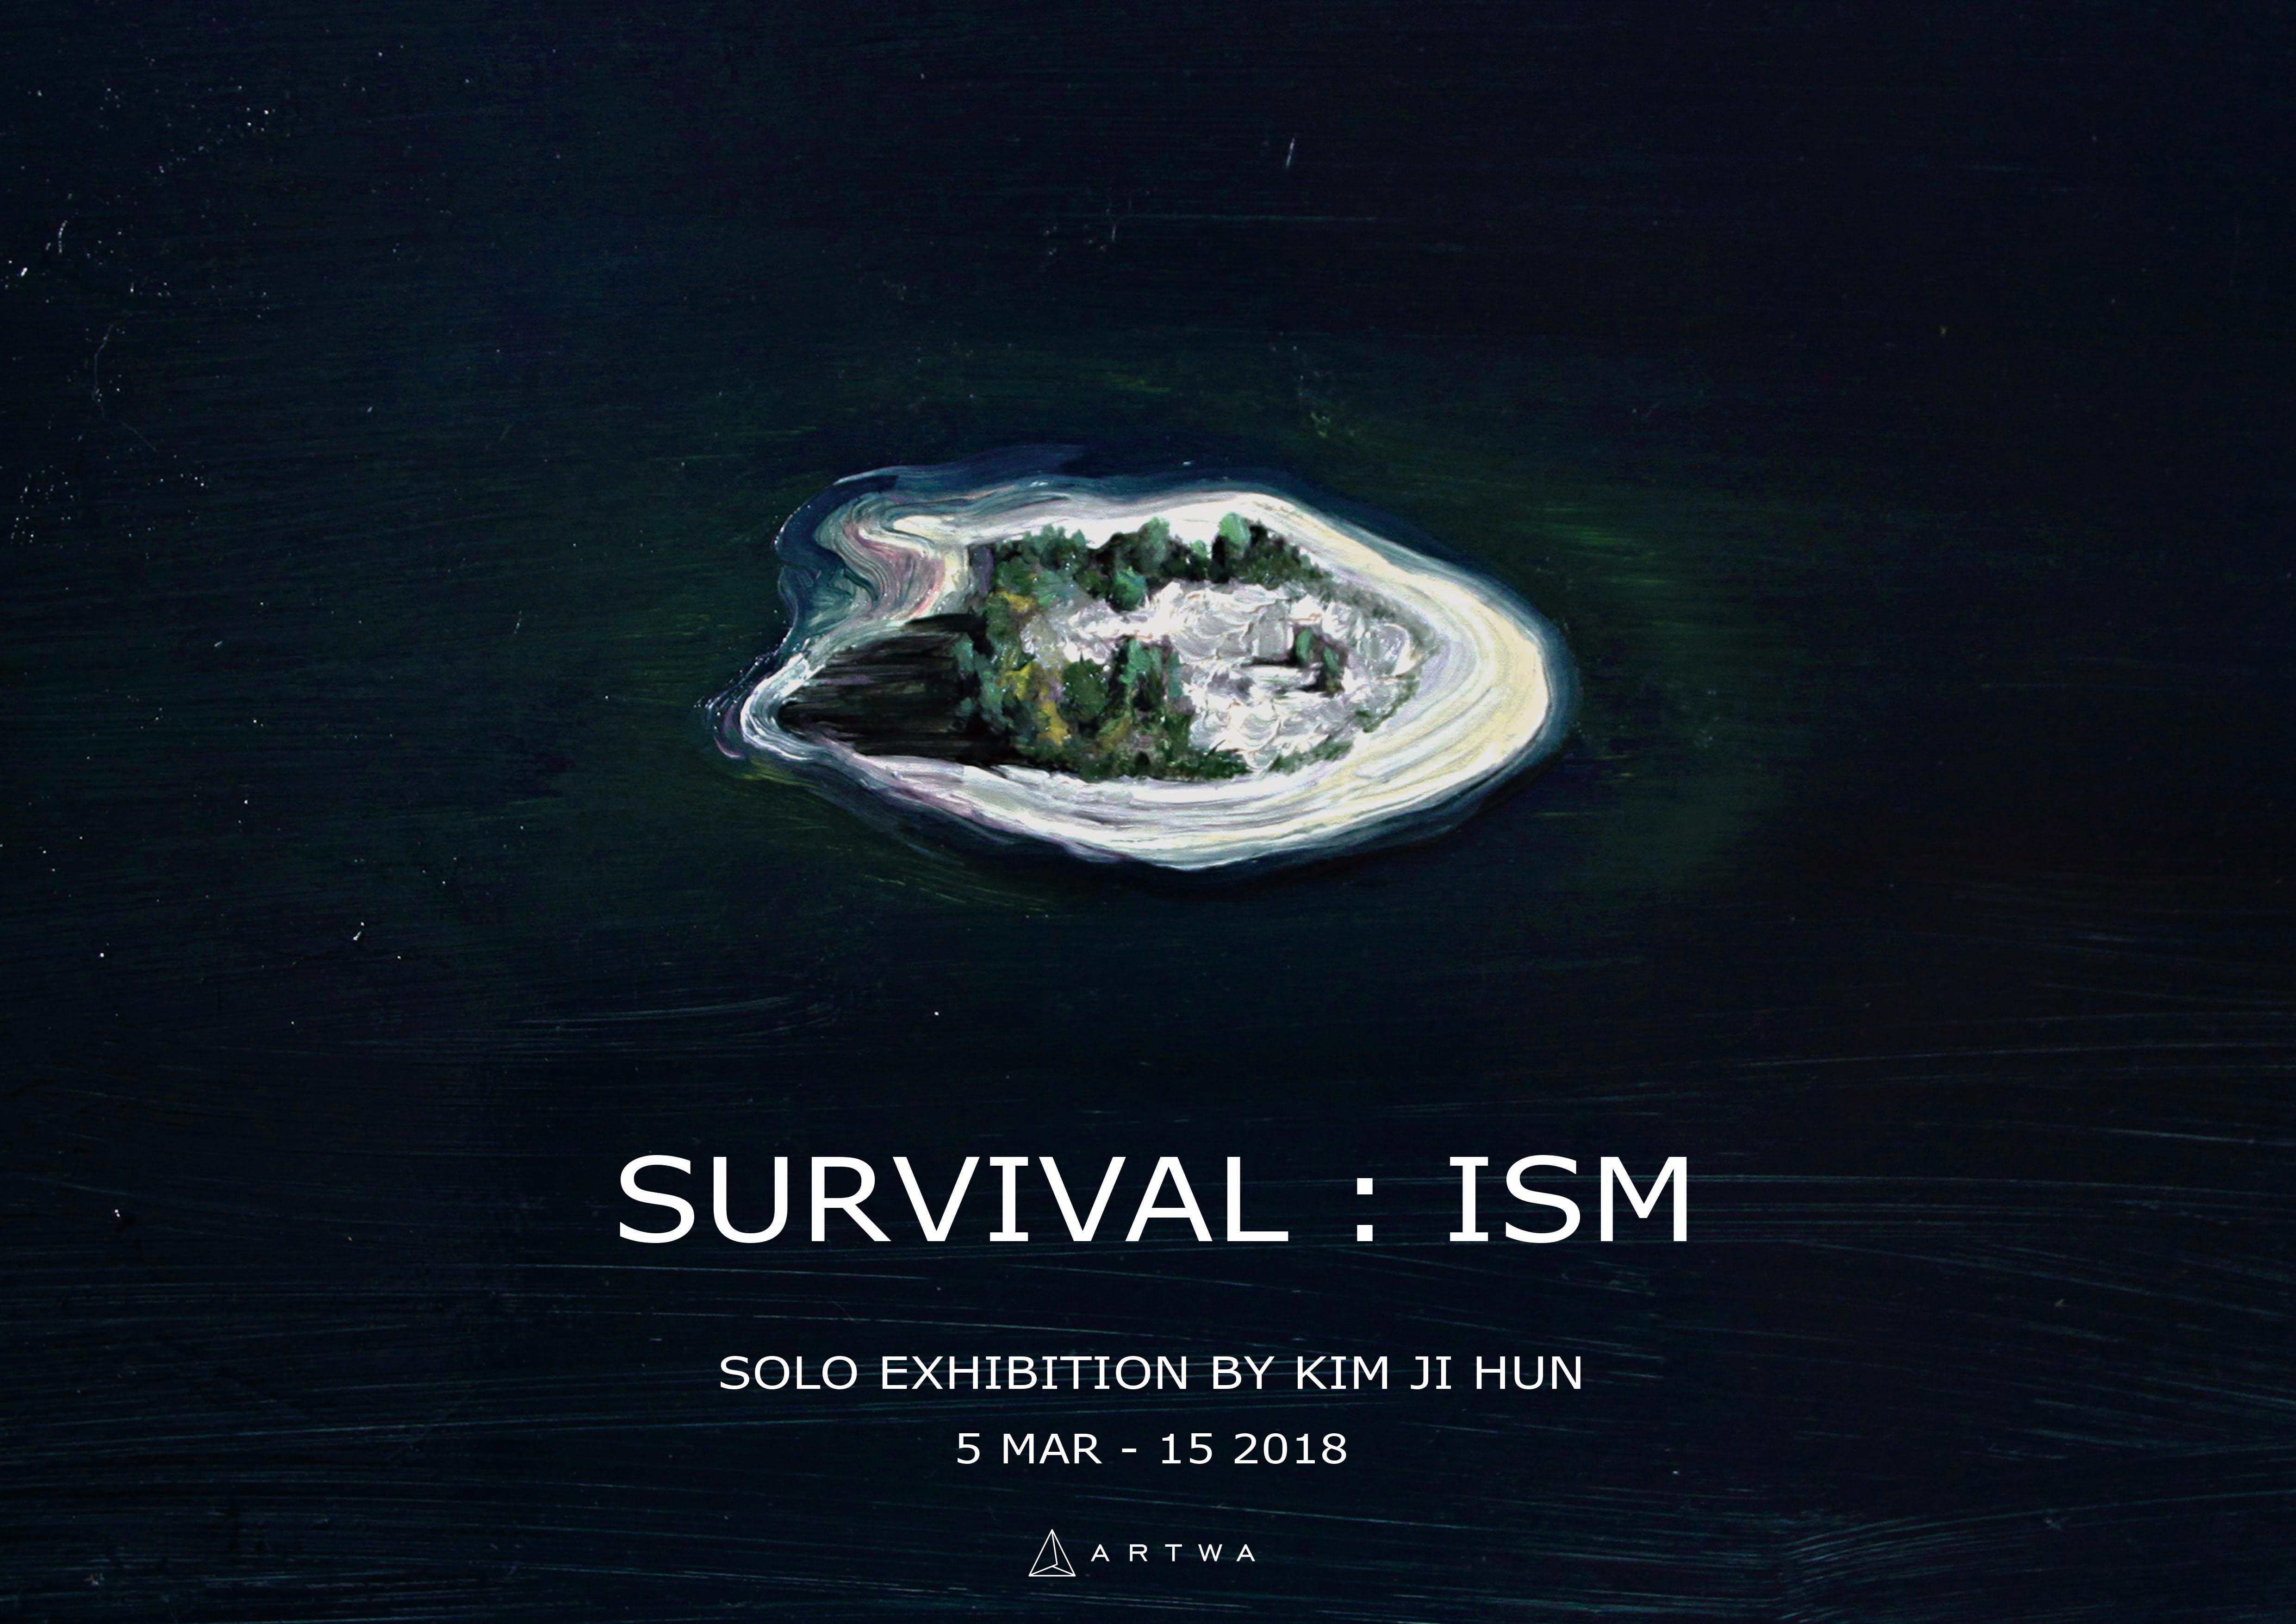 SURVIVAL:ISM